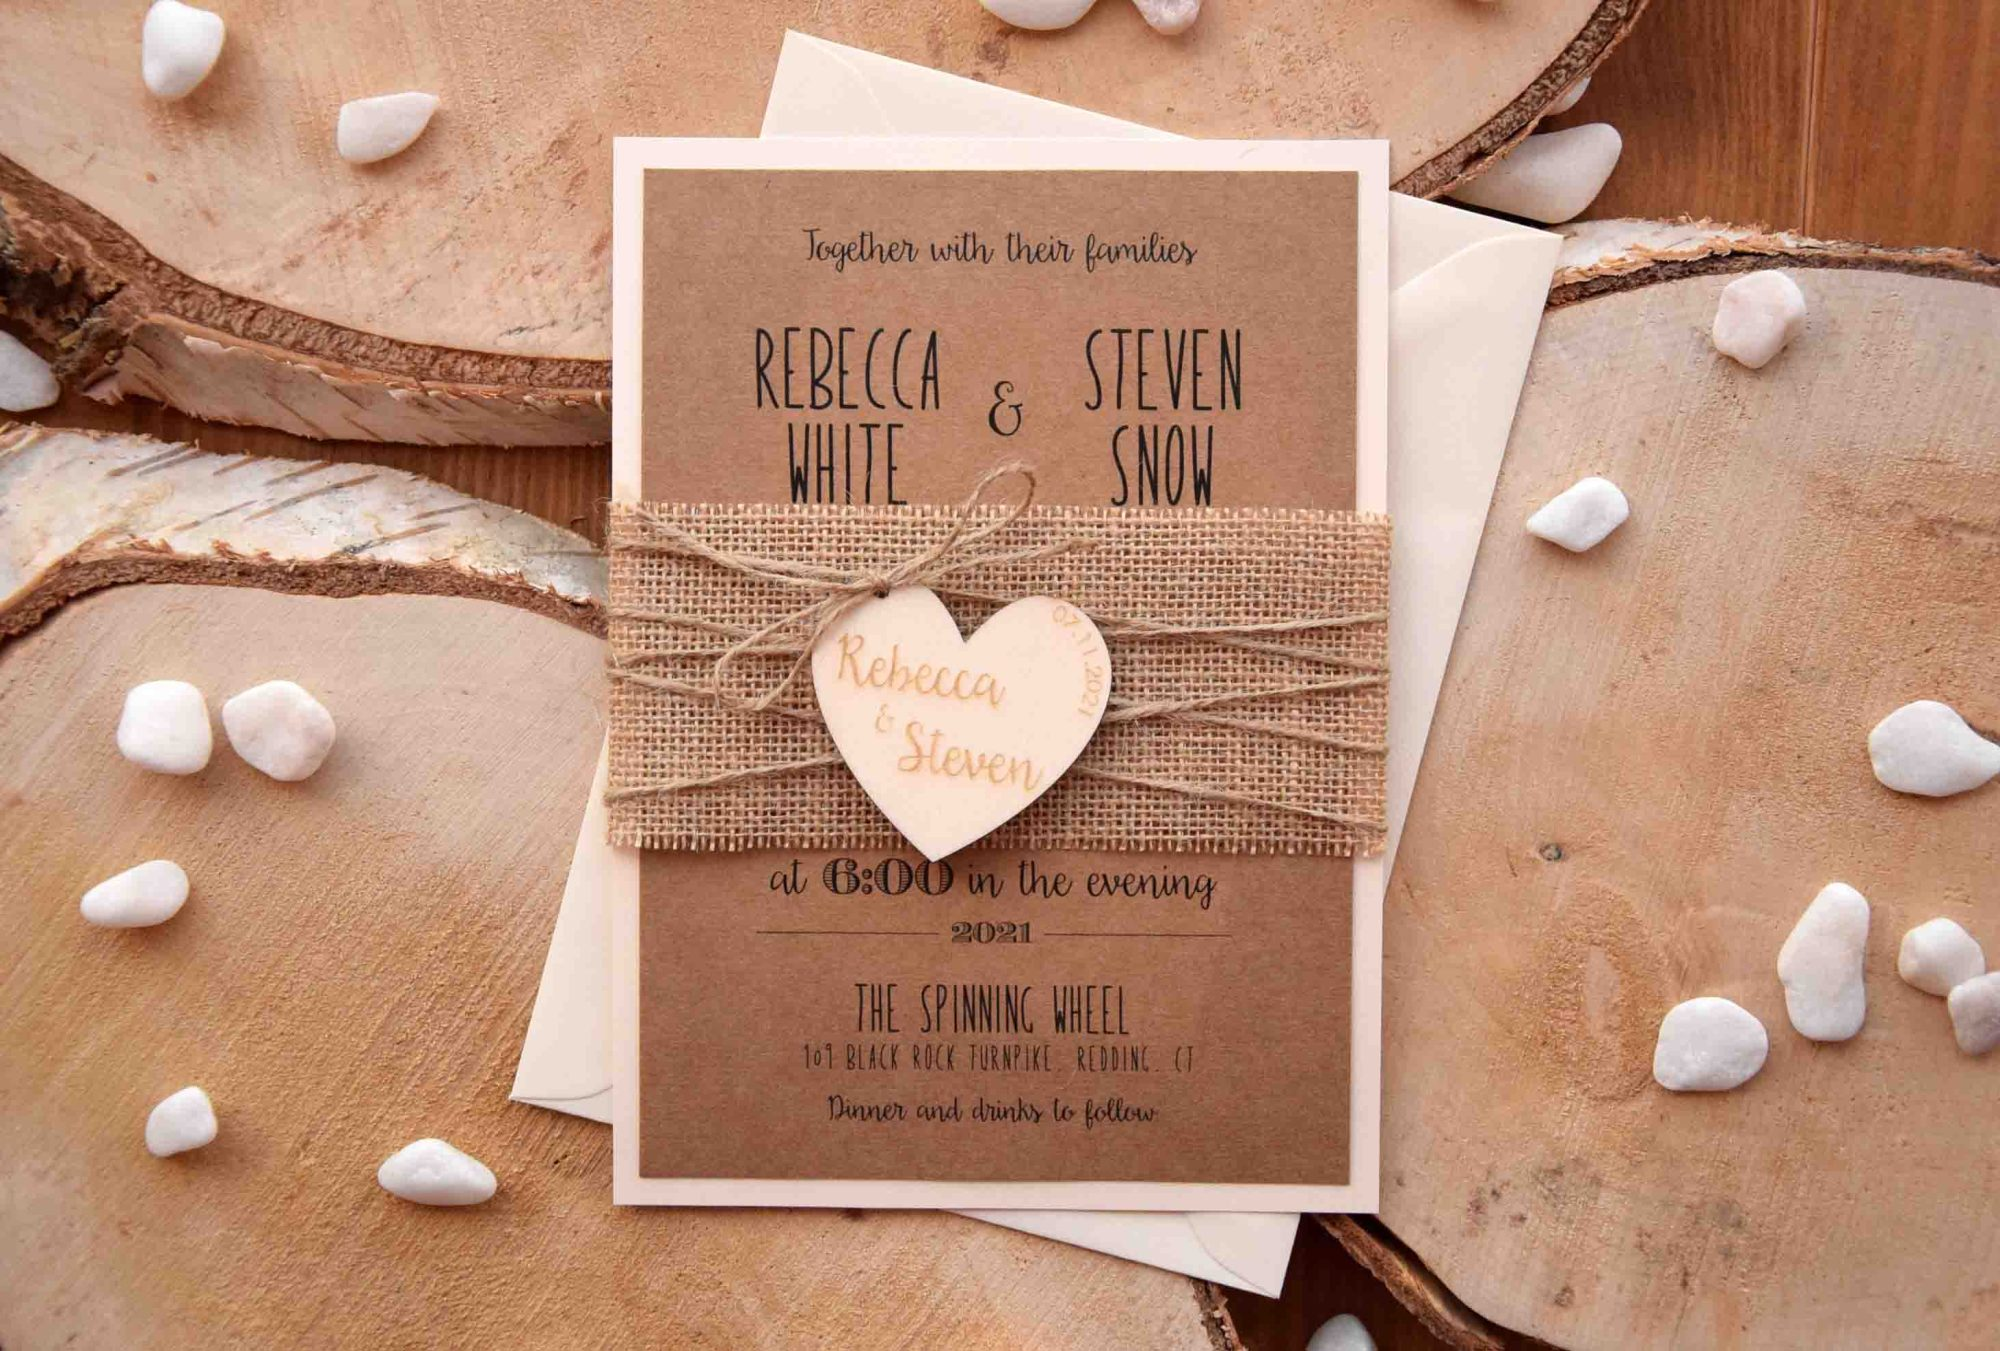 Rustic Wedding Invitation With Wood Heart